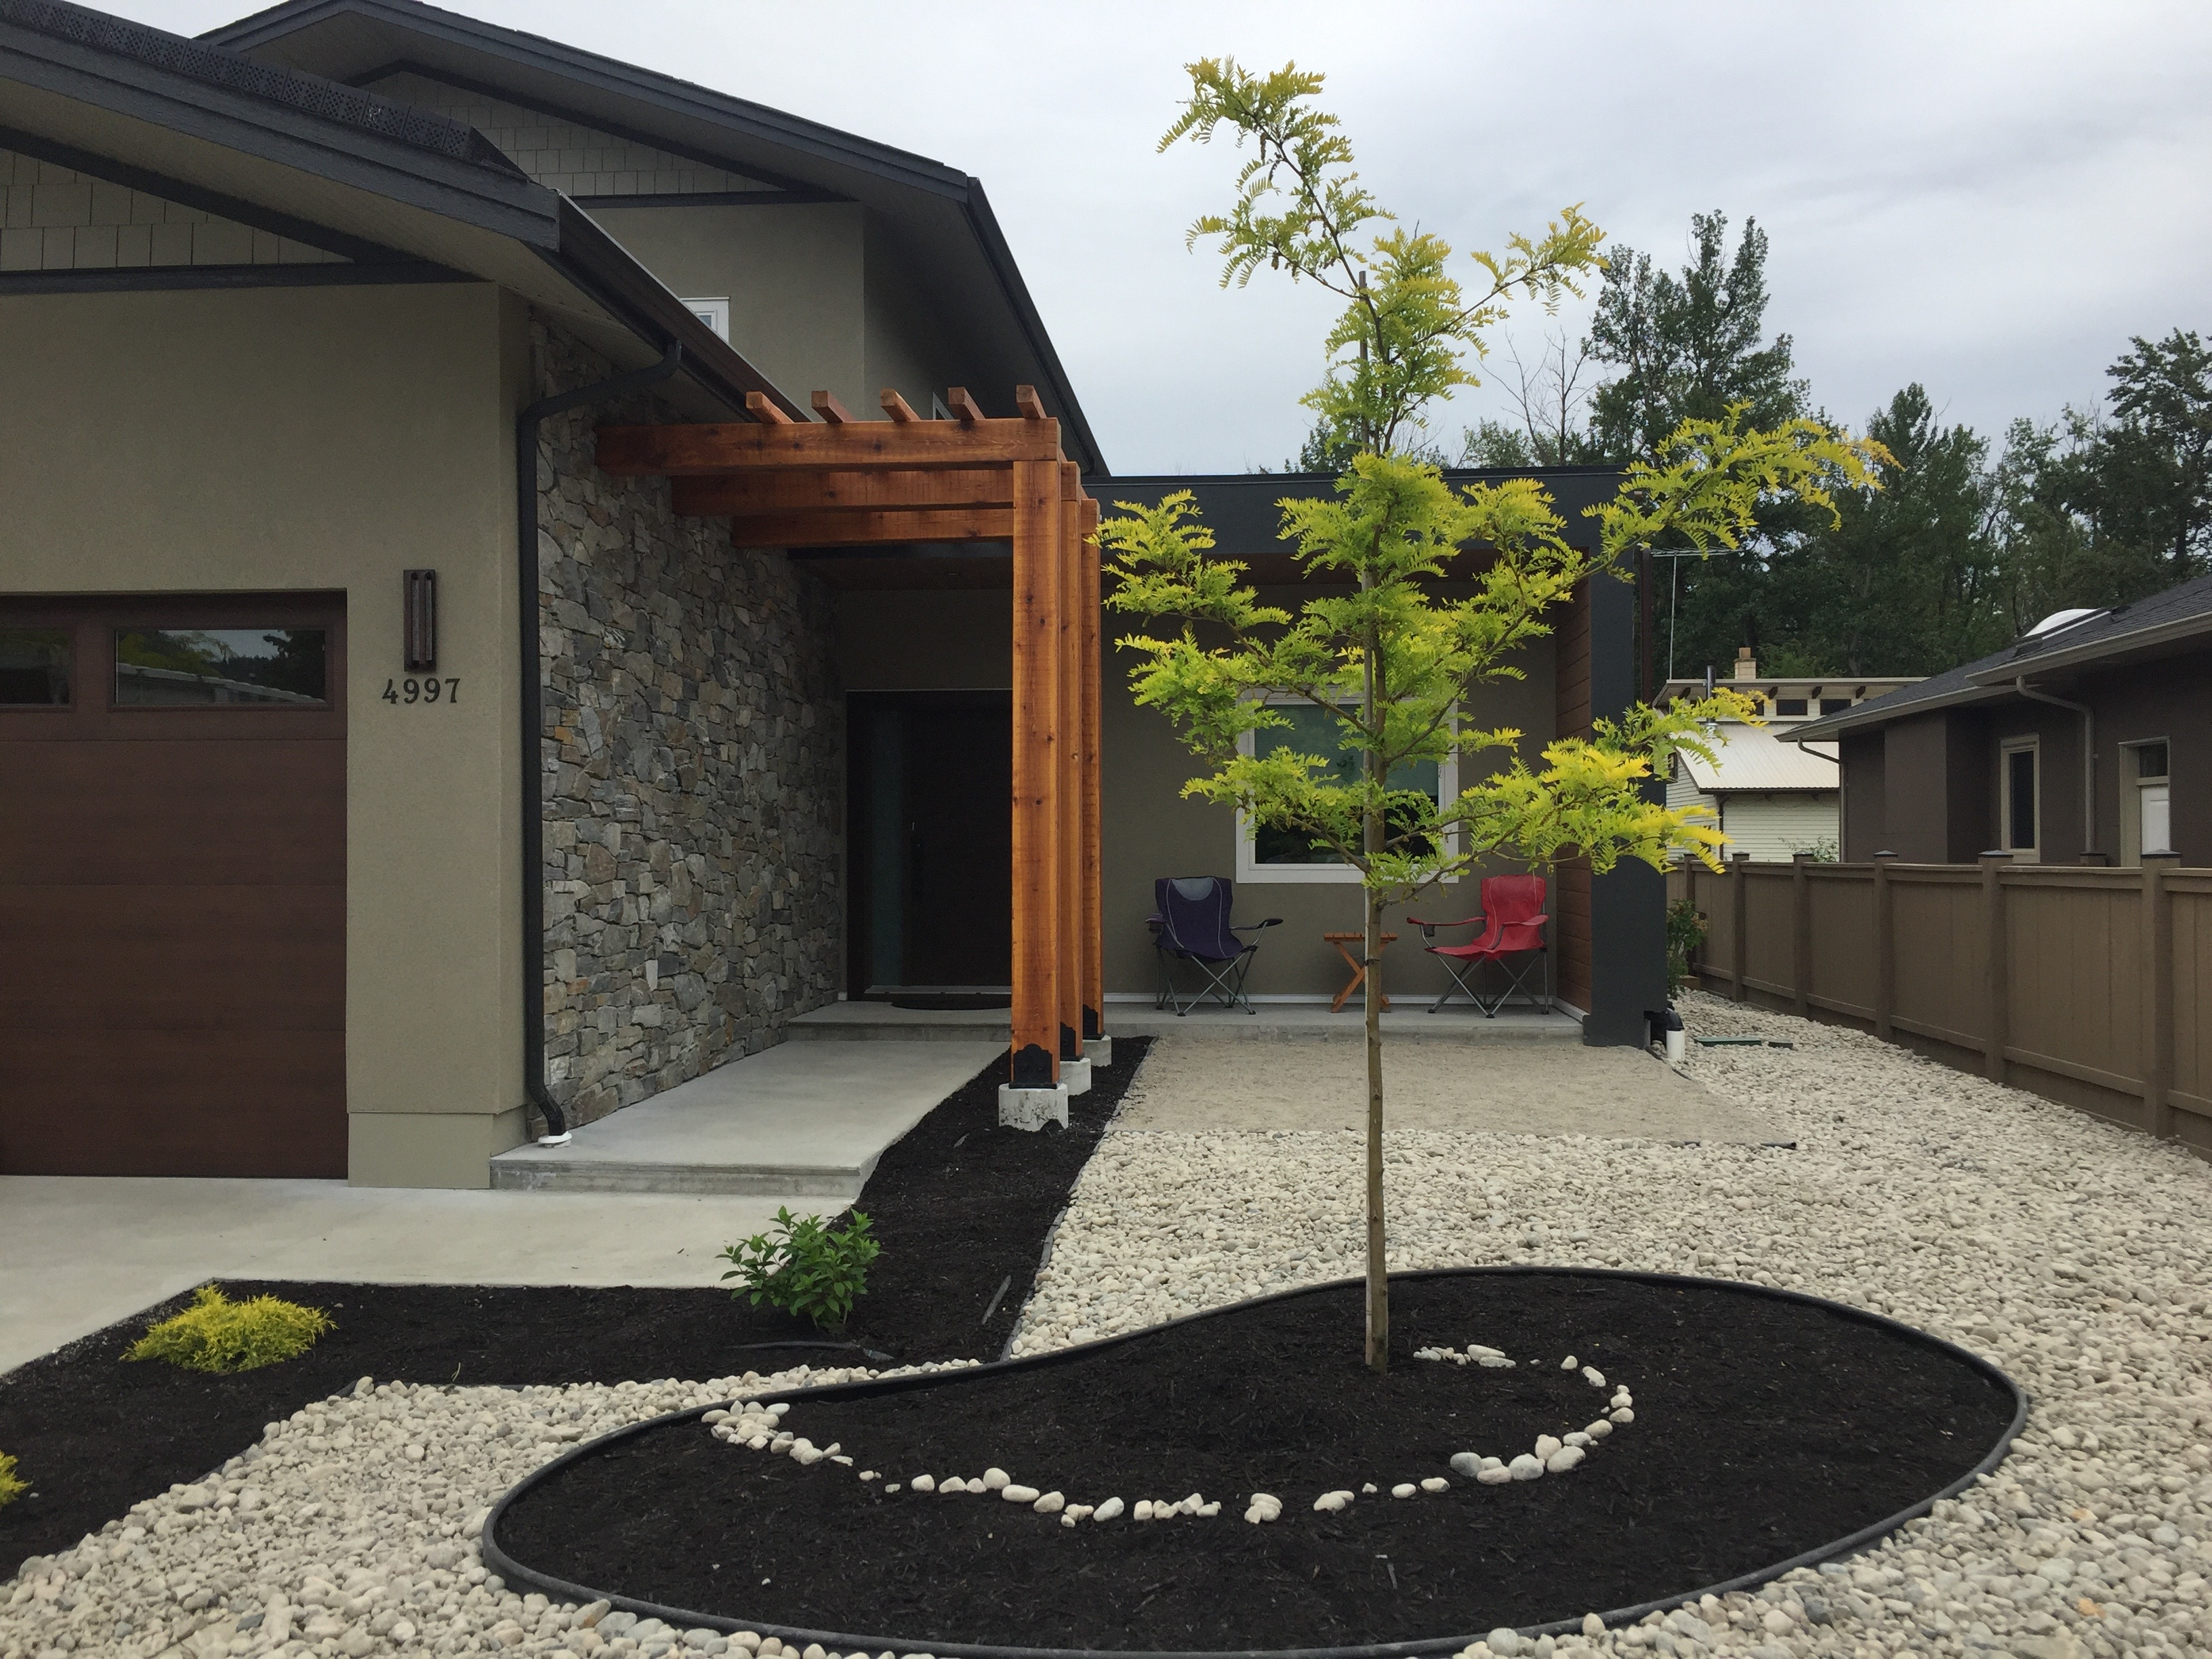 Net Zero Home 2019/20 Design/Build